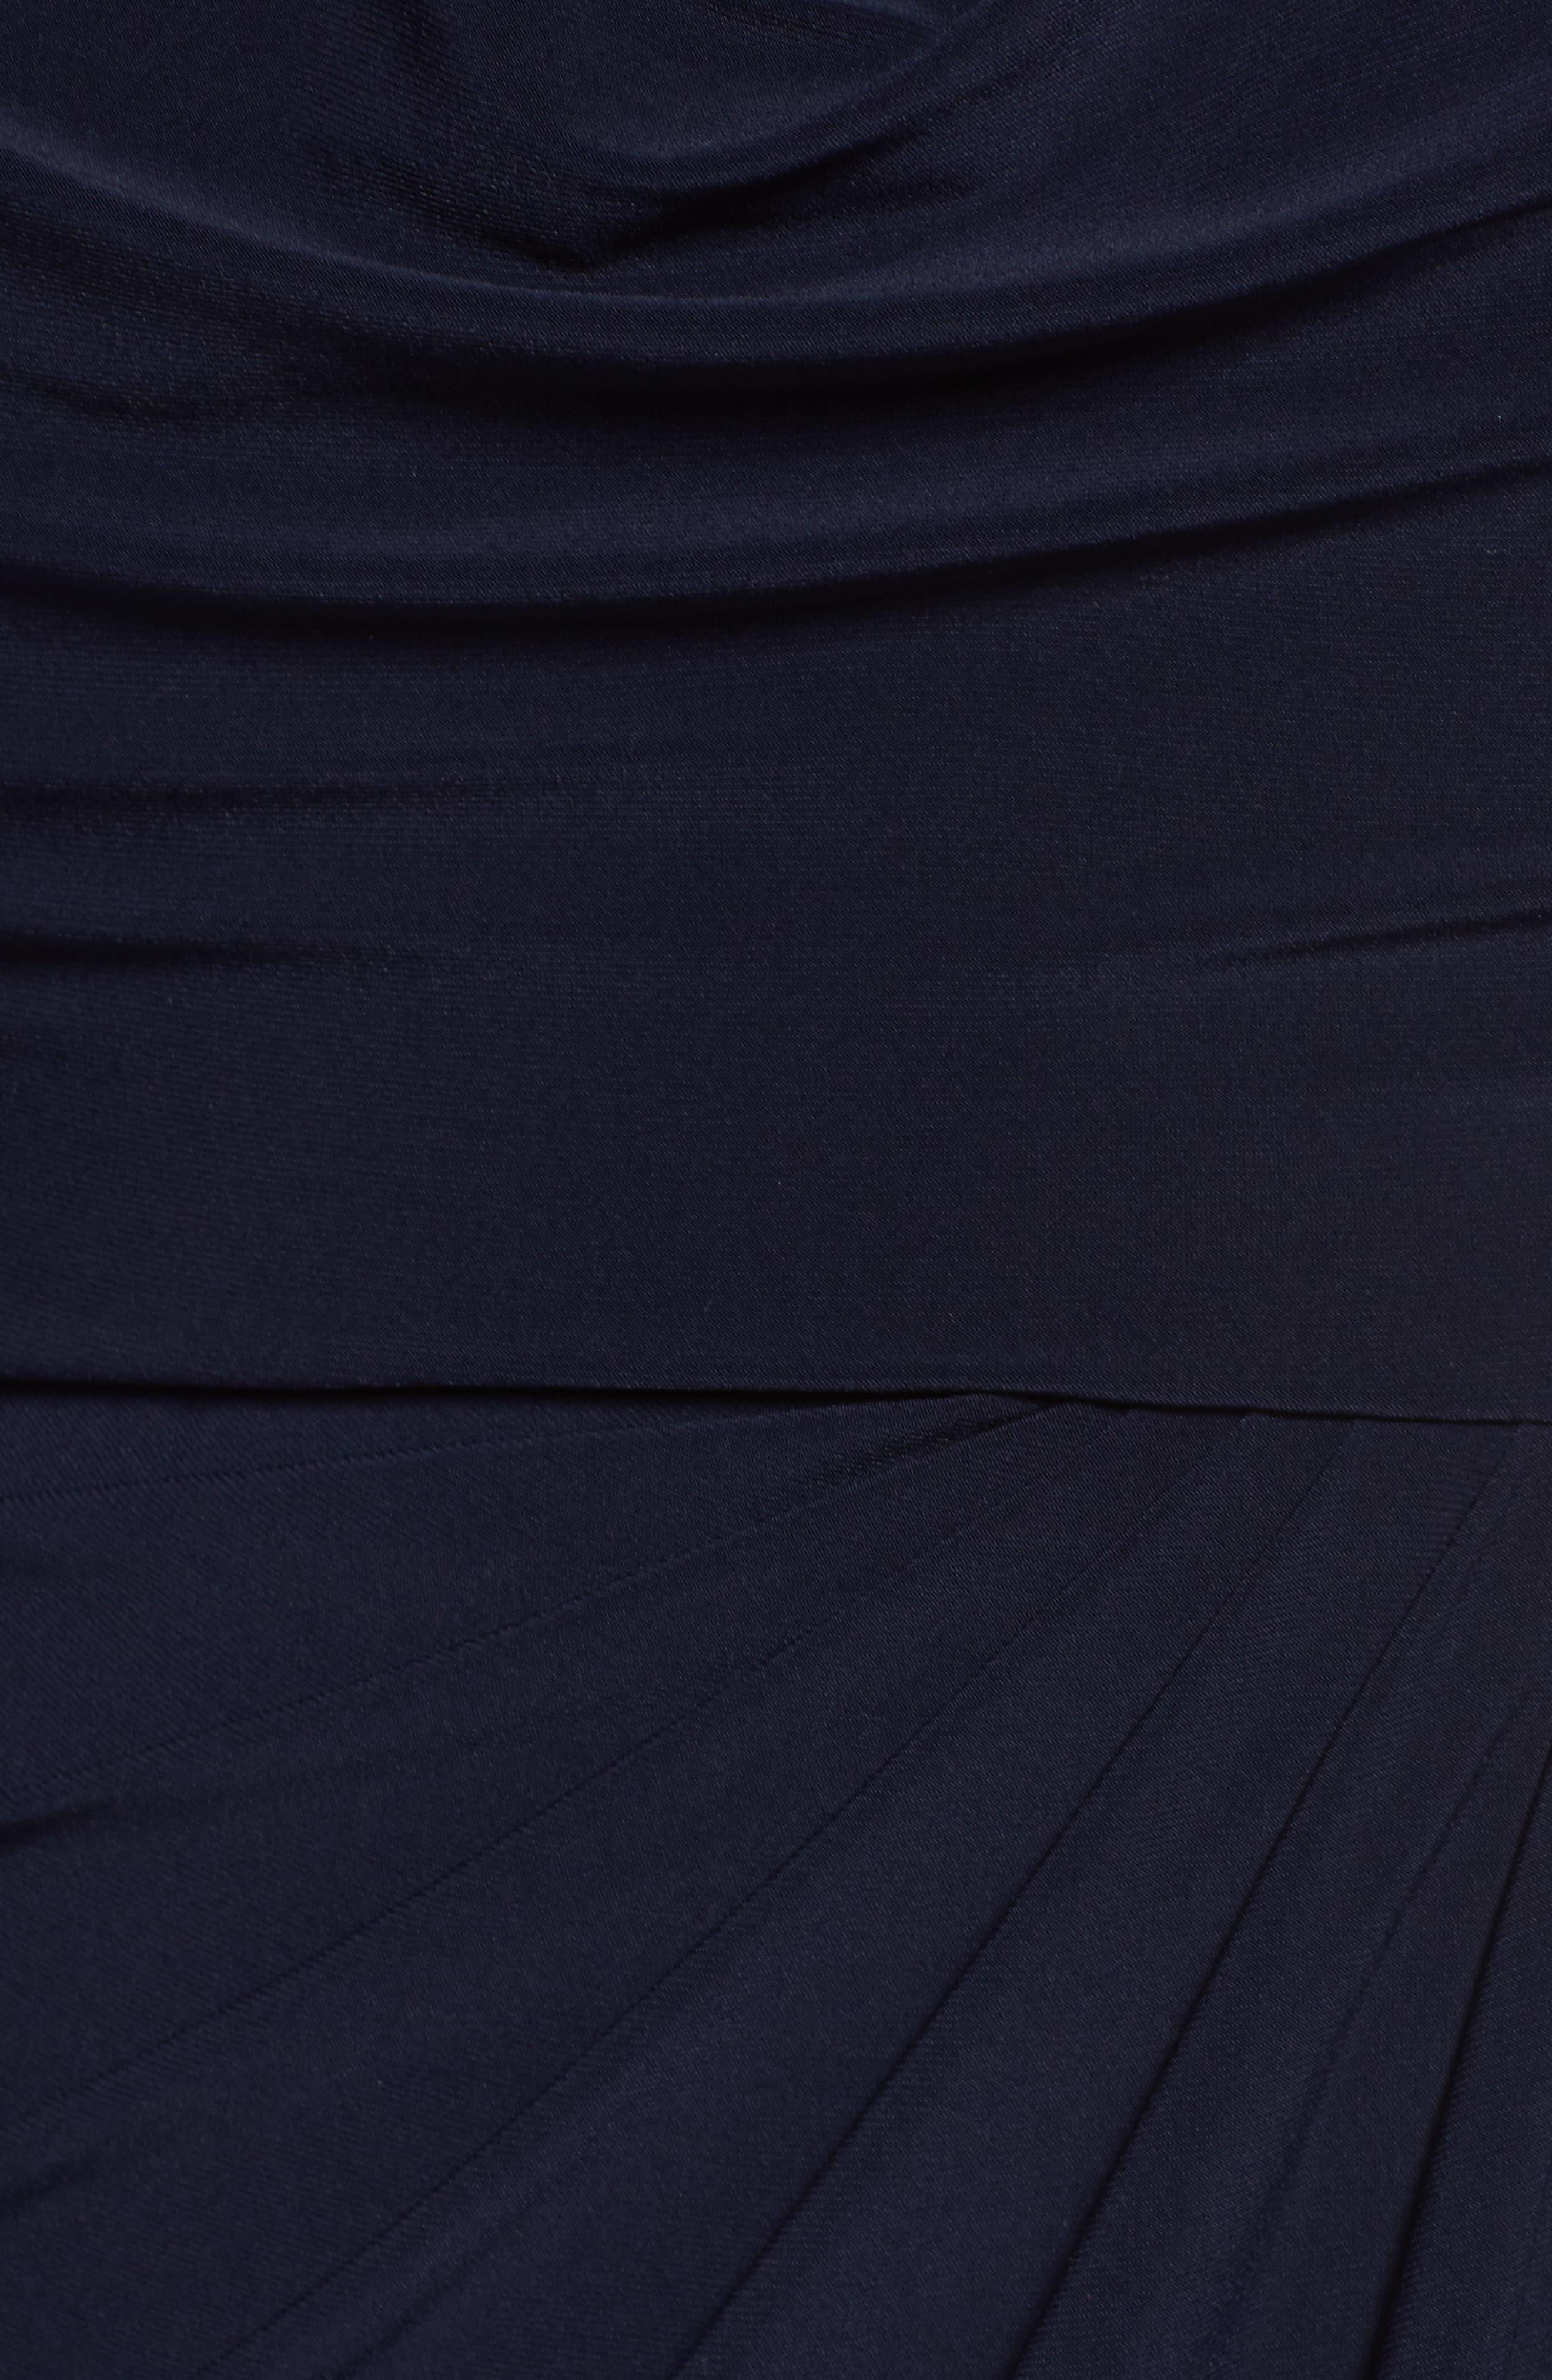 Cowl Neck A-Line Dress,                             Alternate thumbnail 5, color,                             Navy